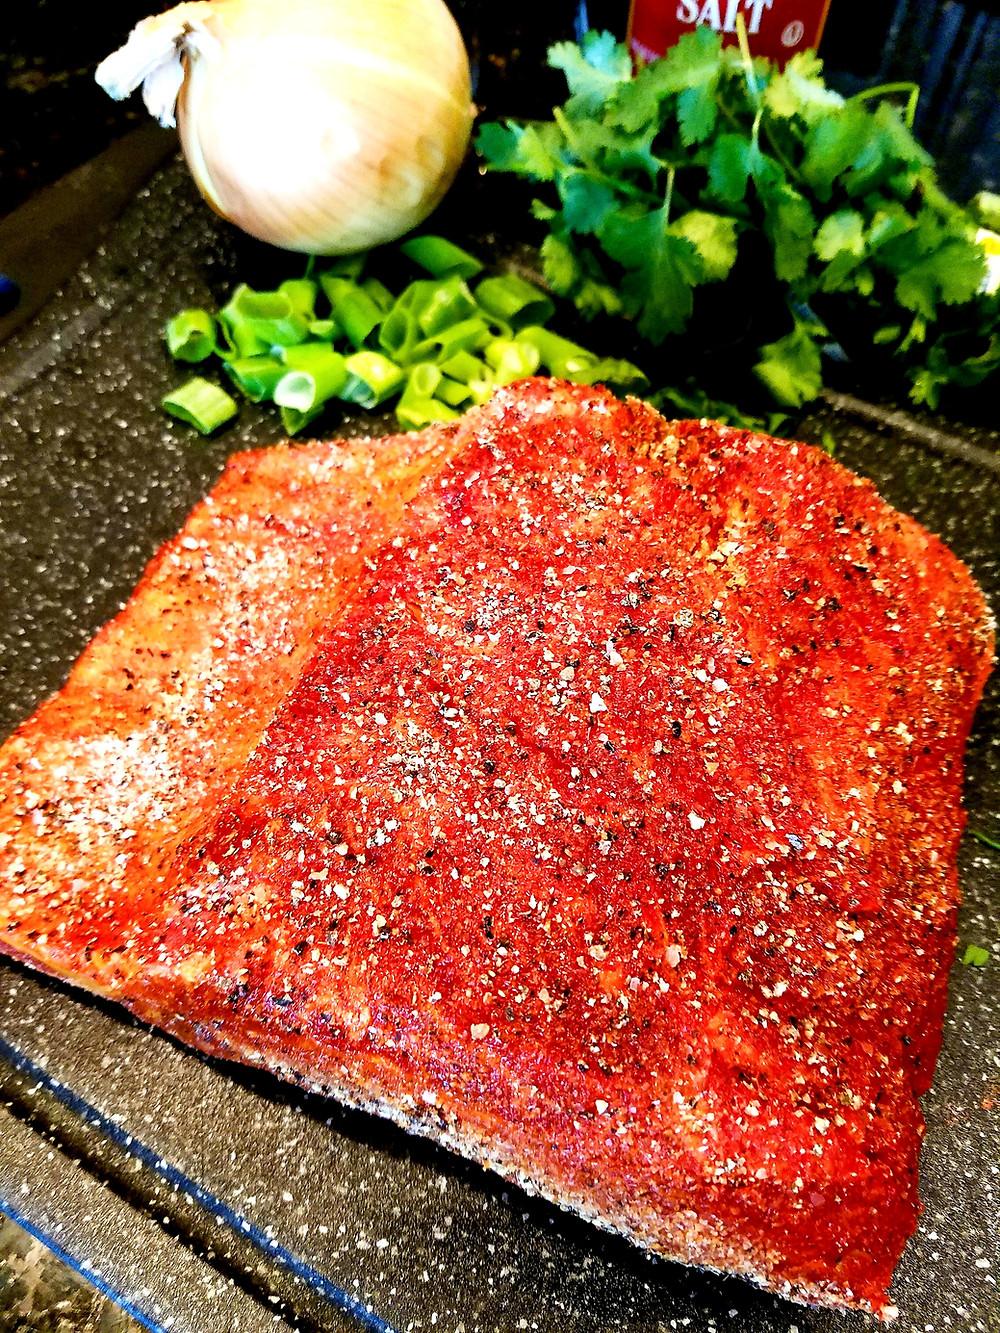 Easy Pork Loin Roast (Gluten-free, no soy/dairy/grains)